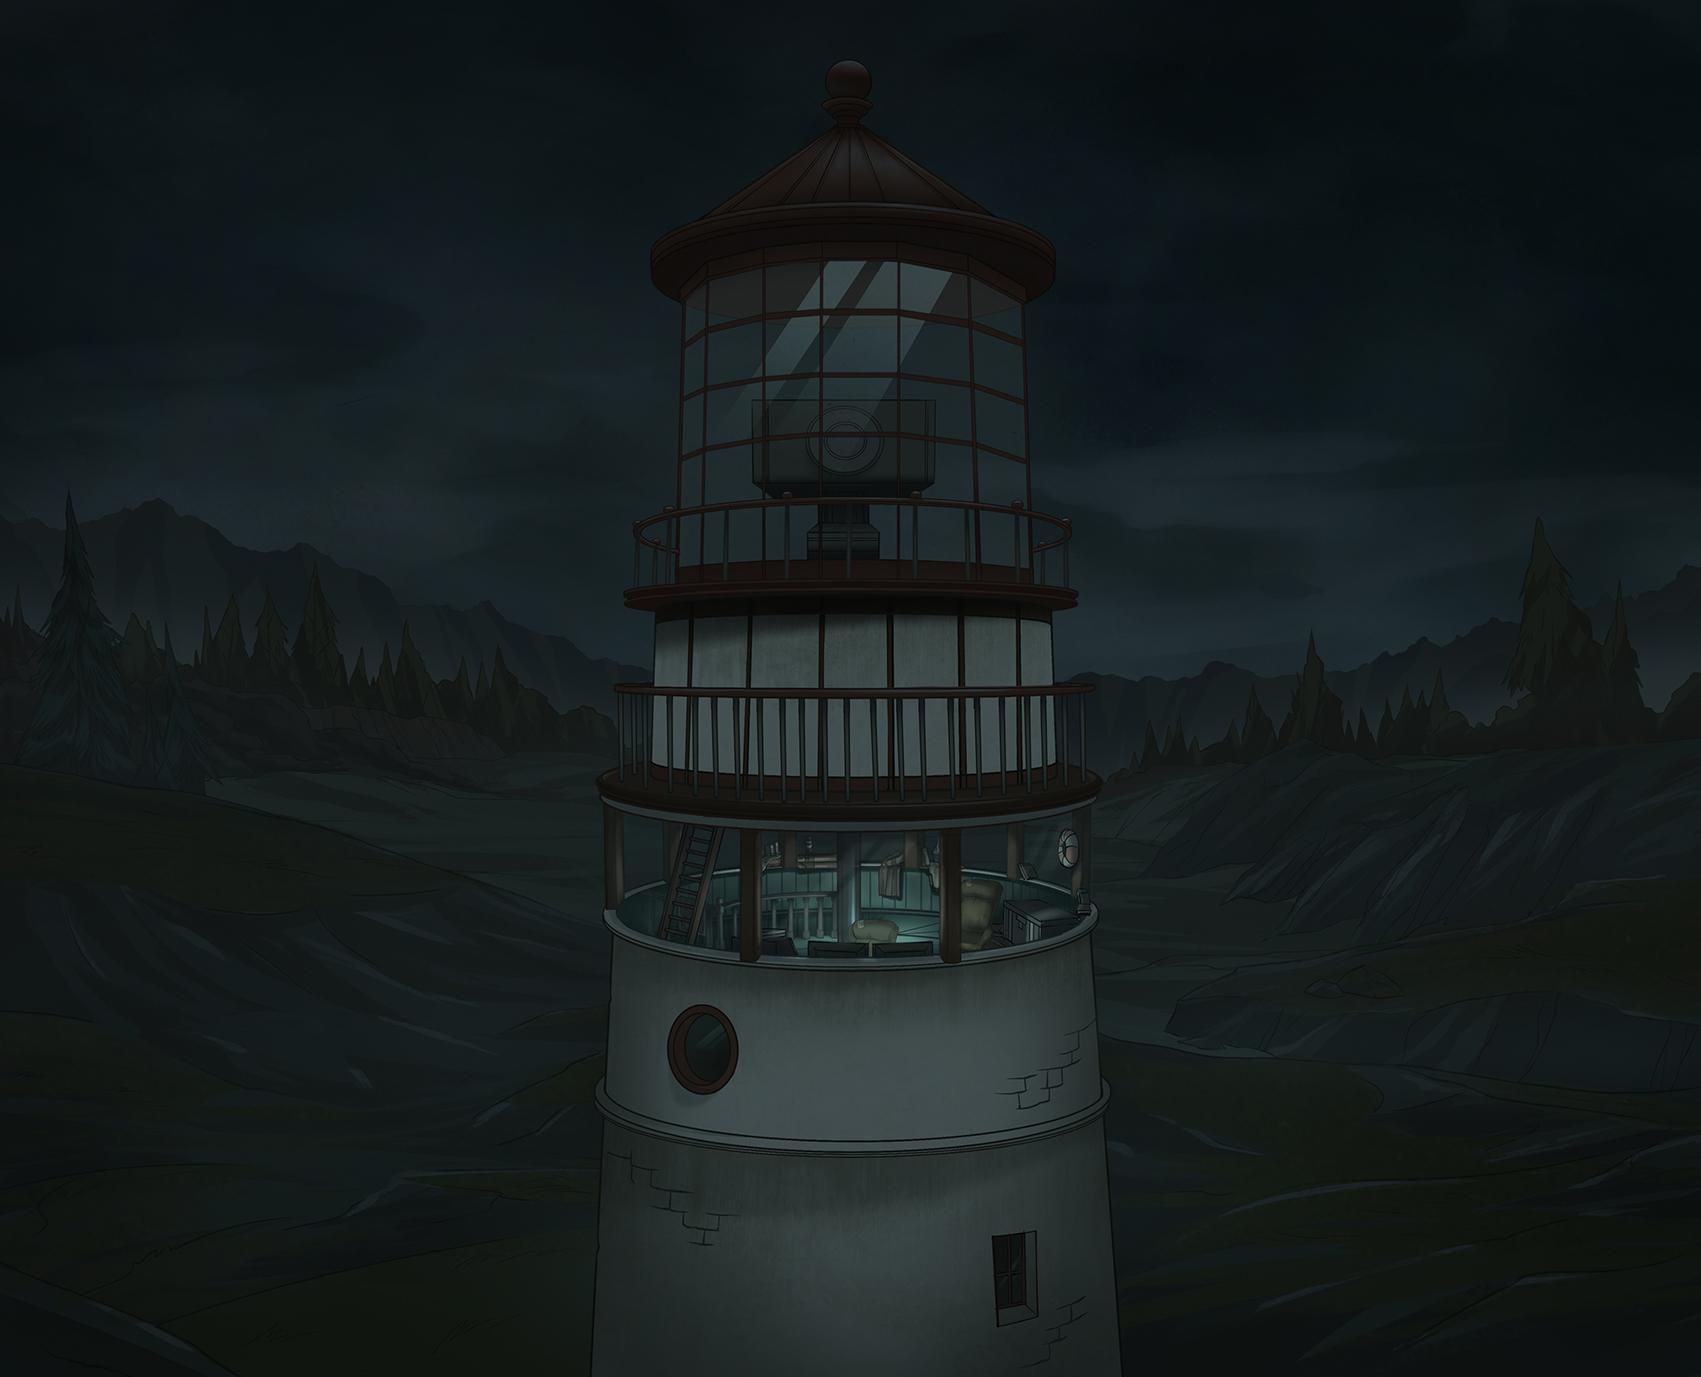 lighthouse72dpi.jpg